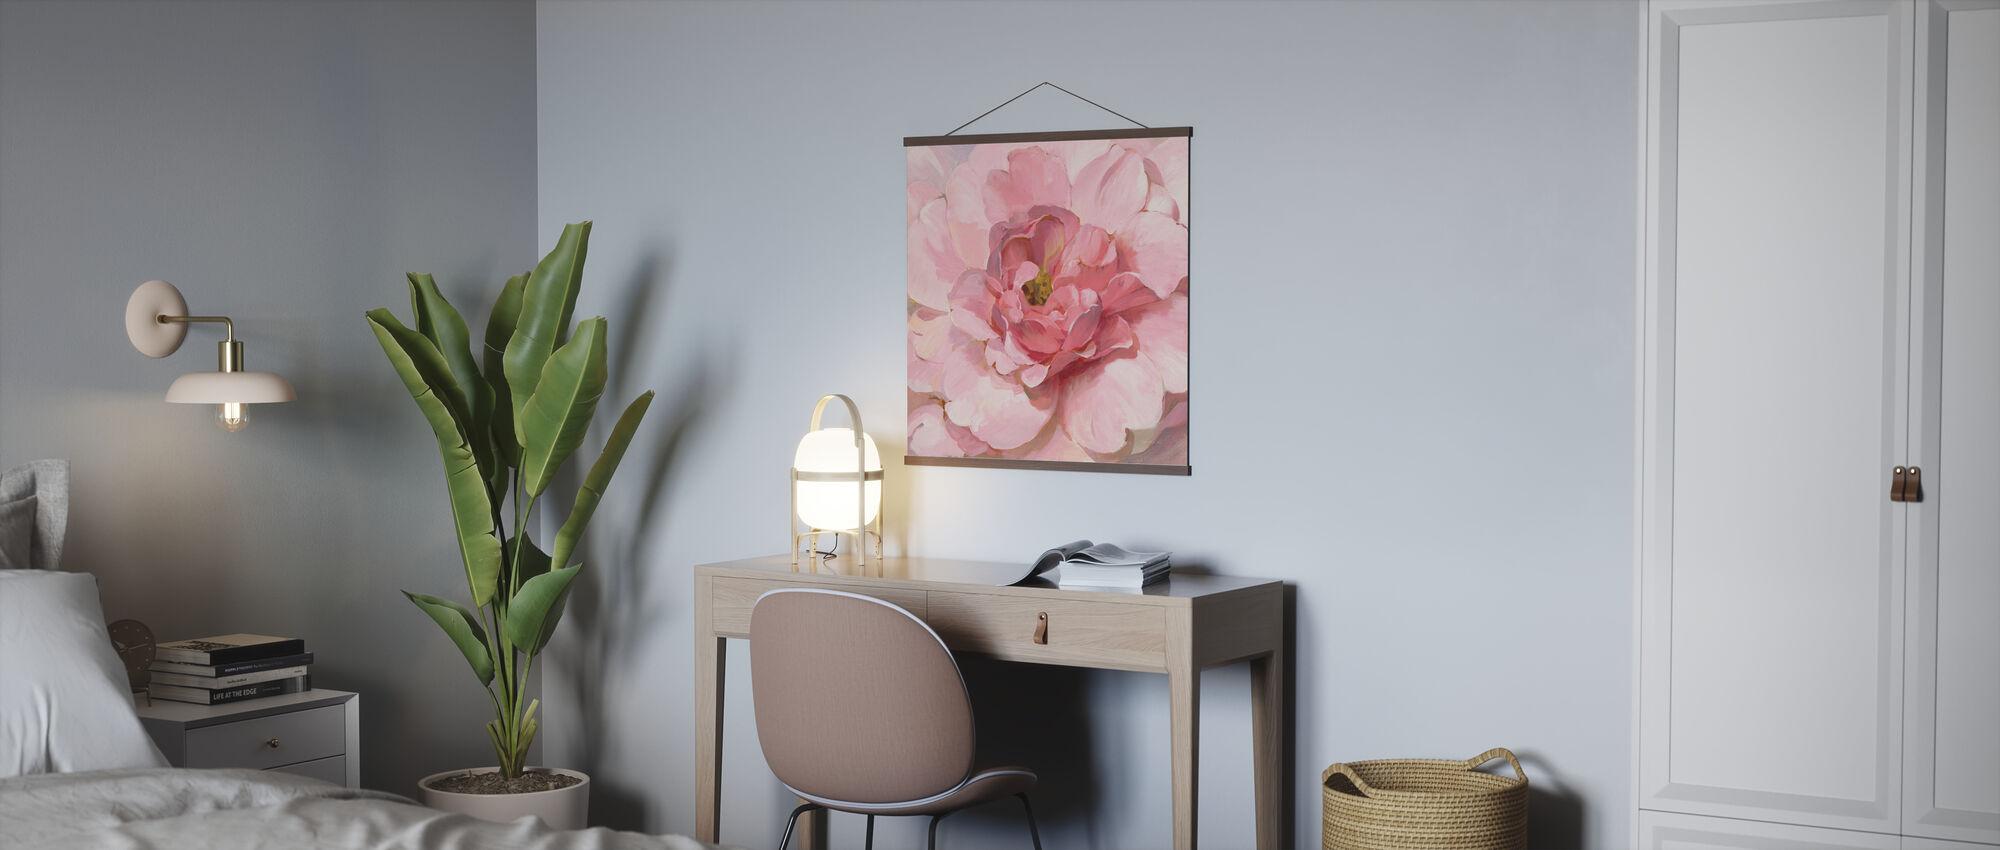 Blushing Peony - Poster - Office